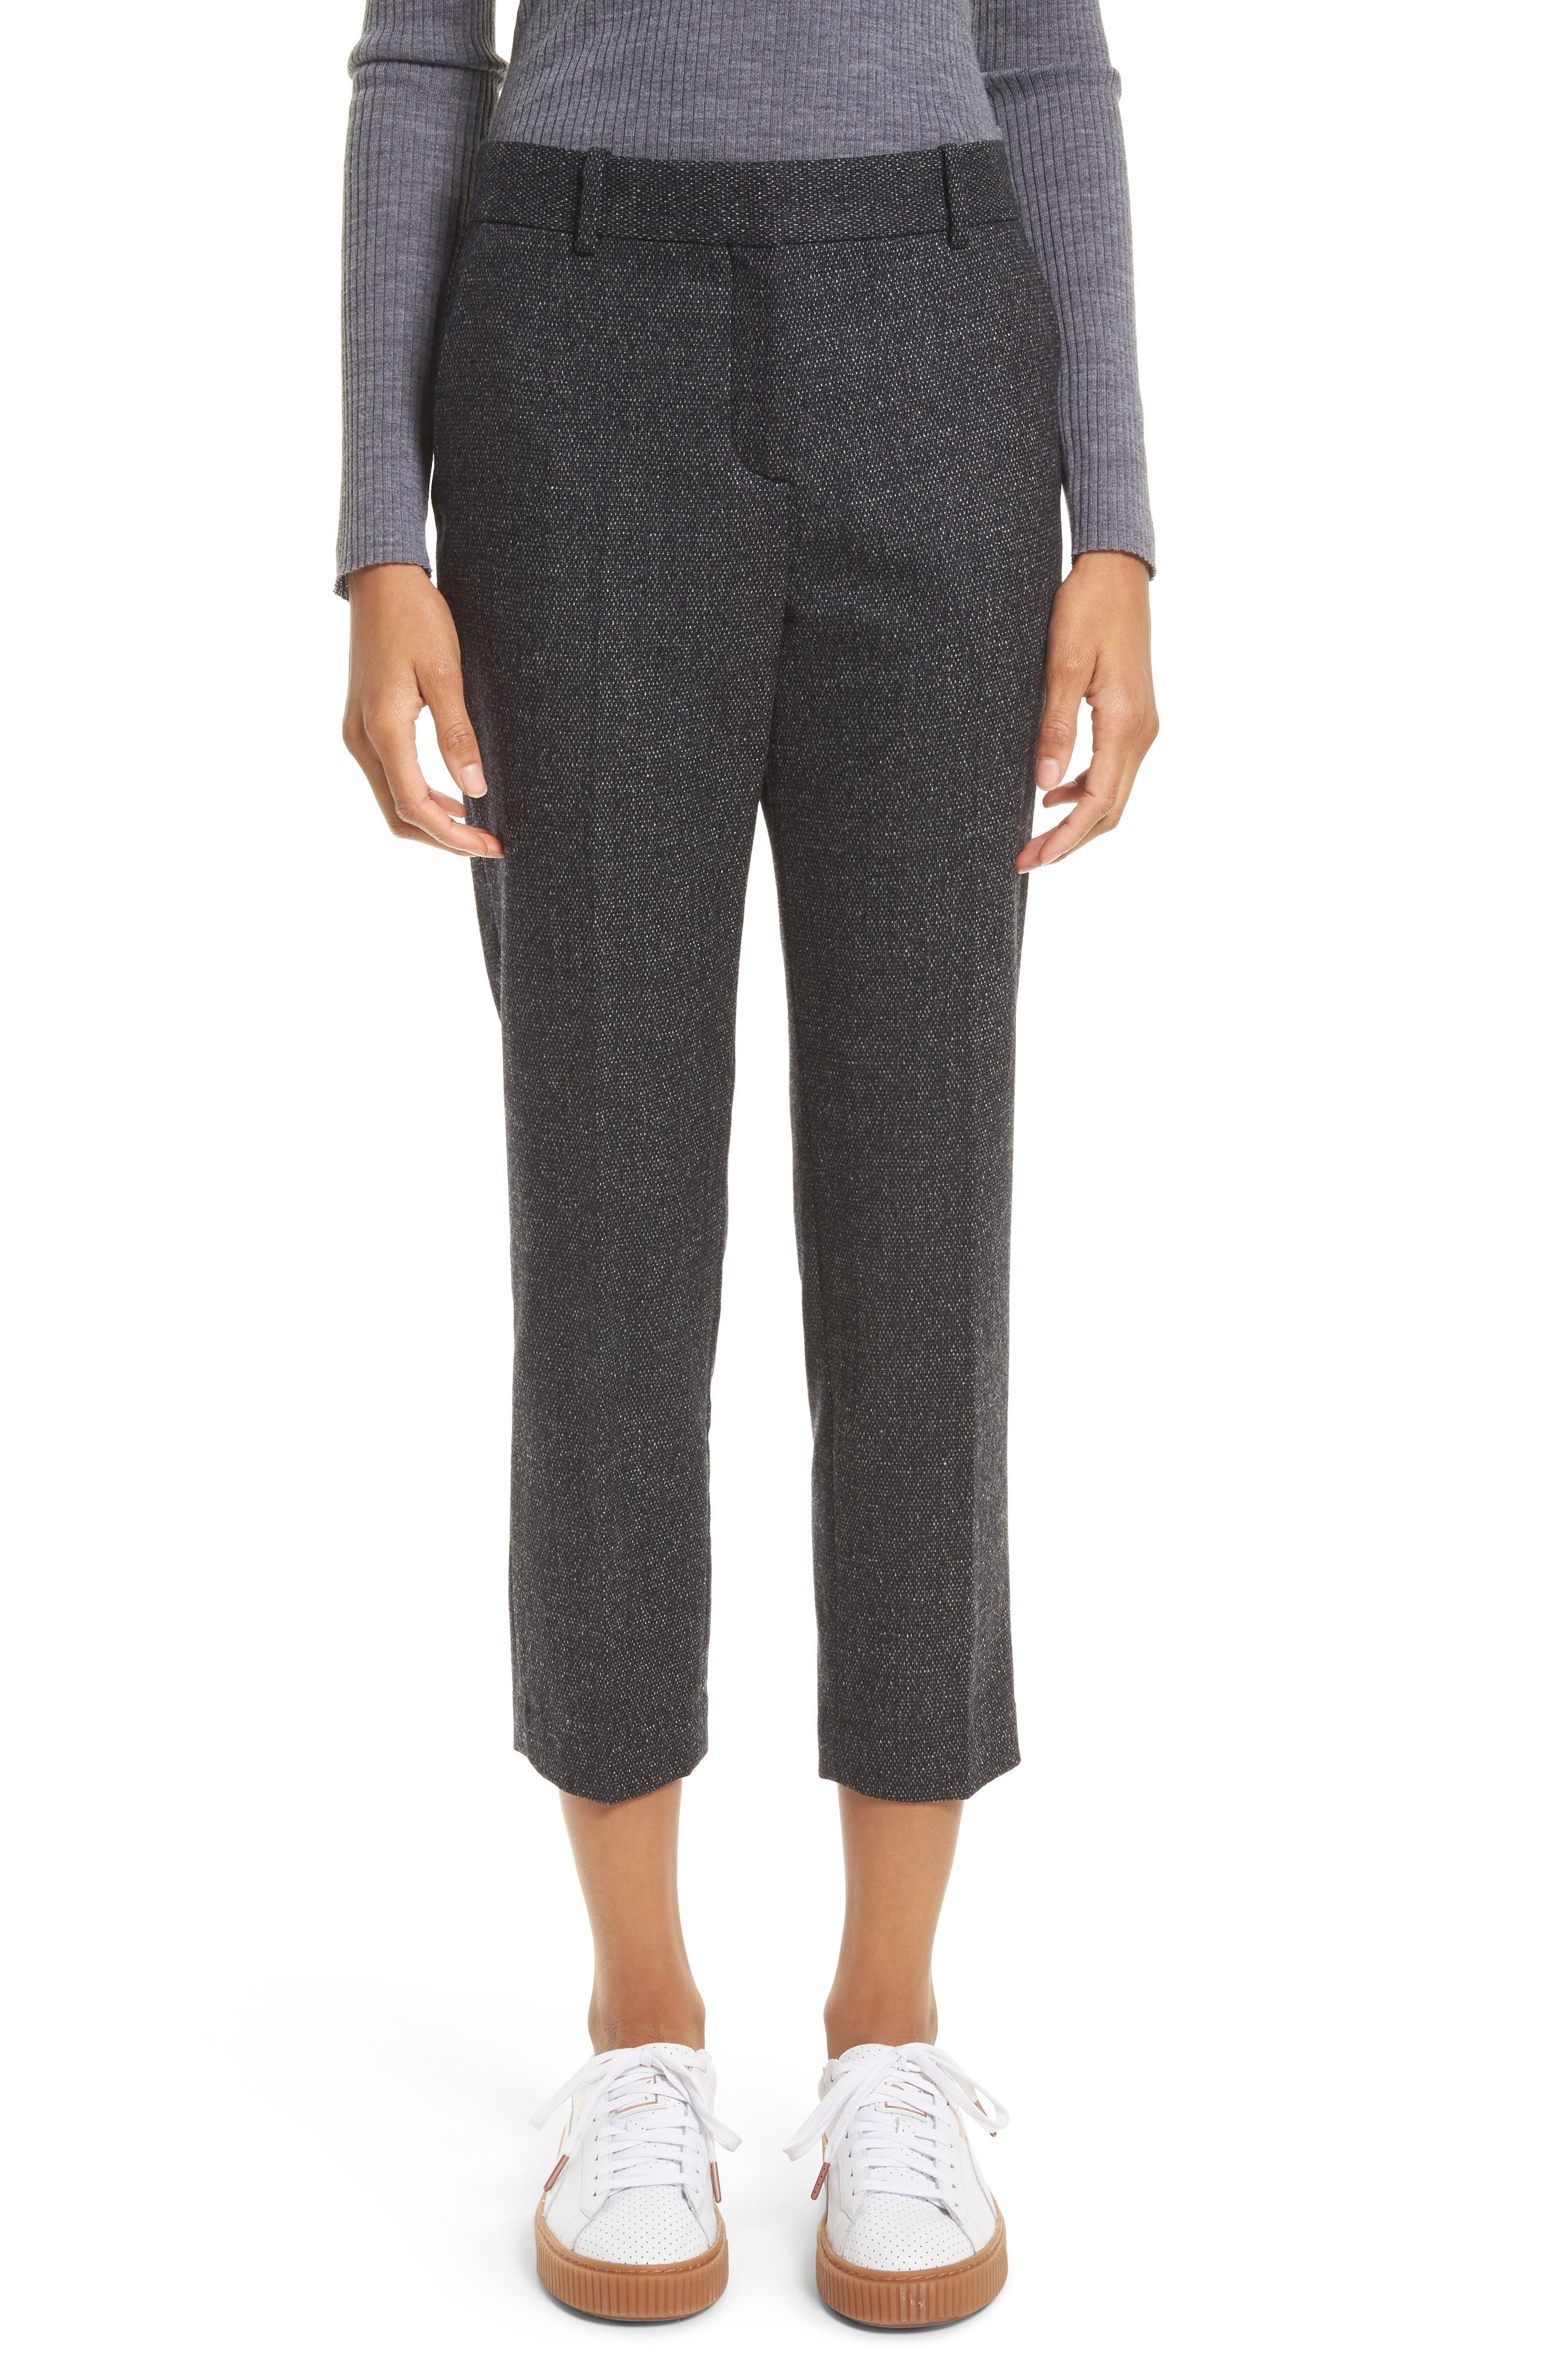 Theory Treeca 2 Flannel Tweed Pants